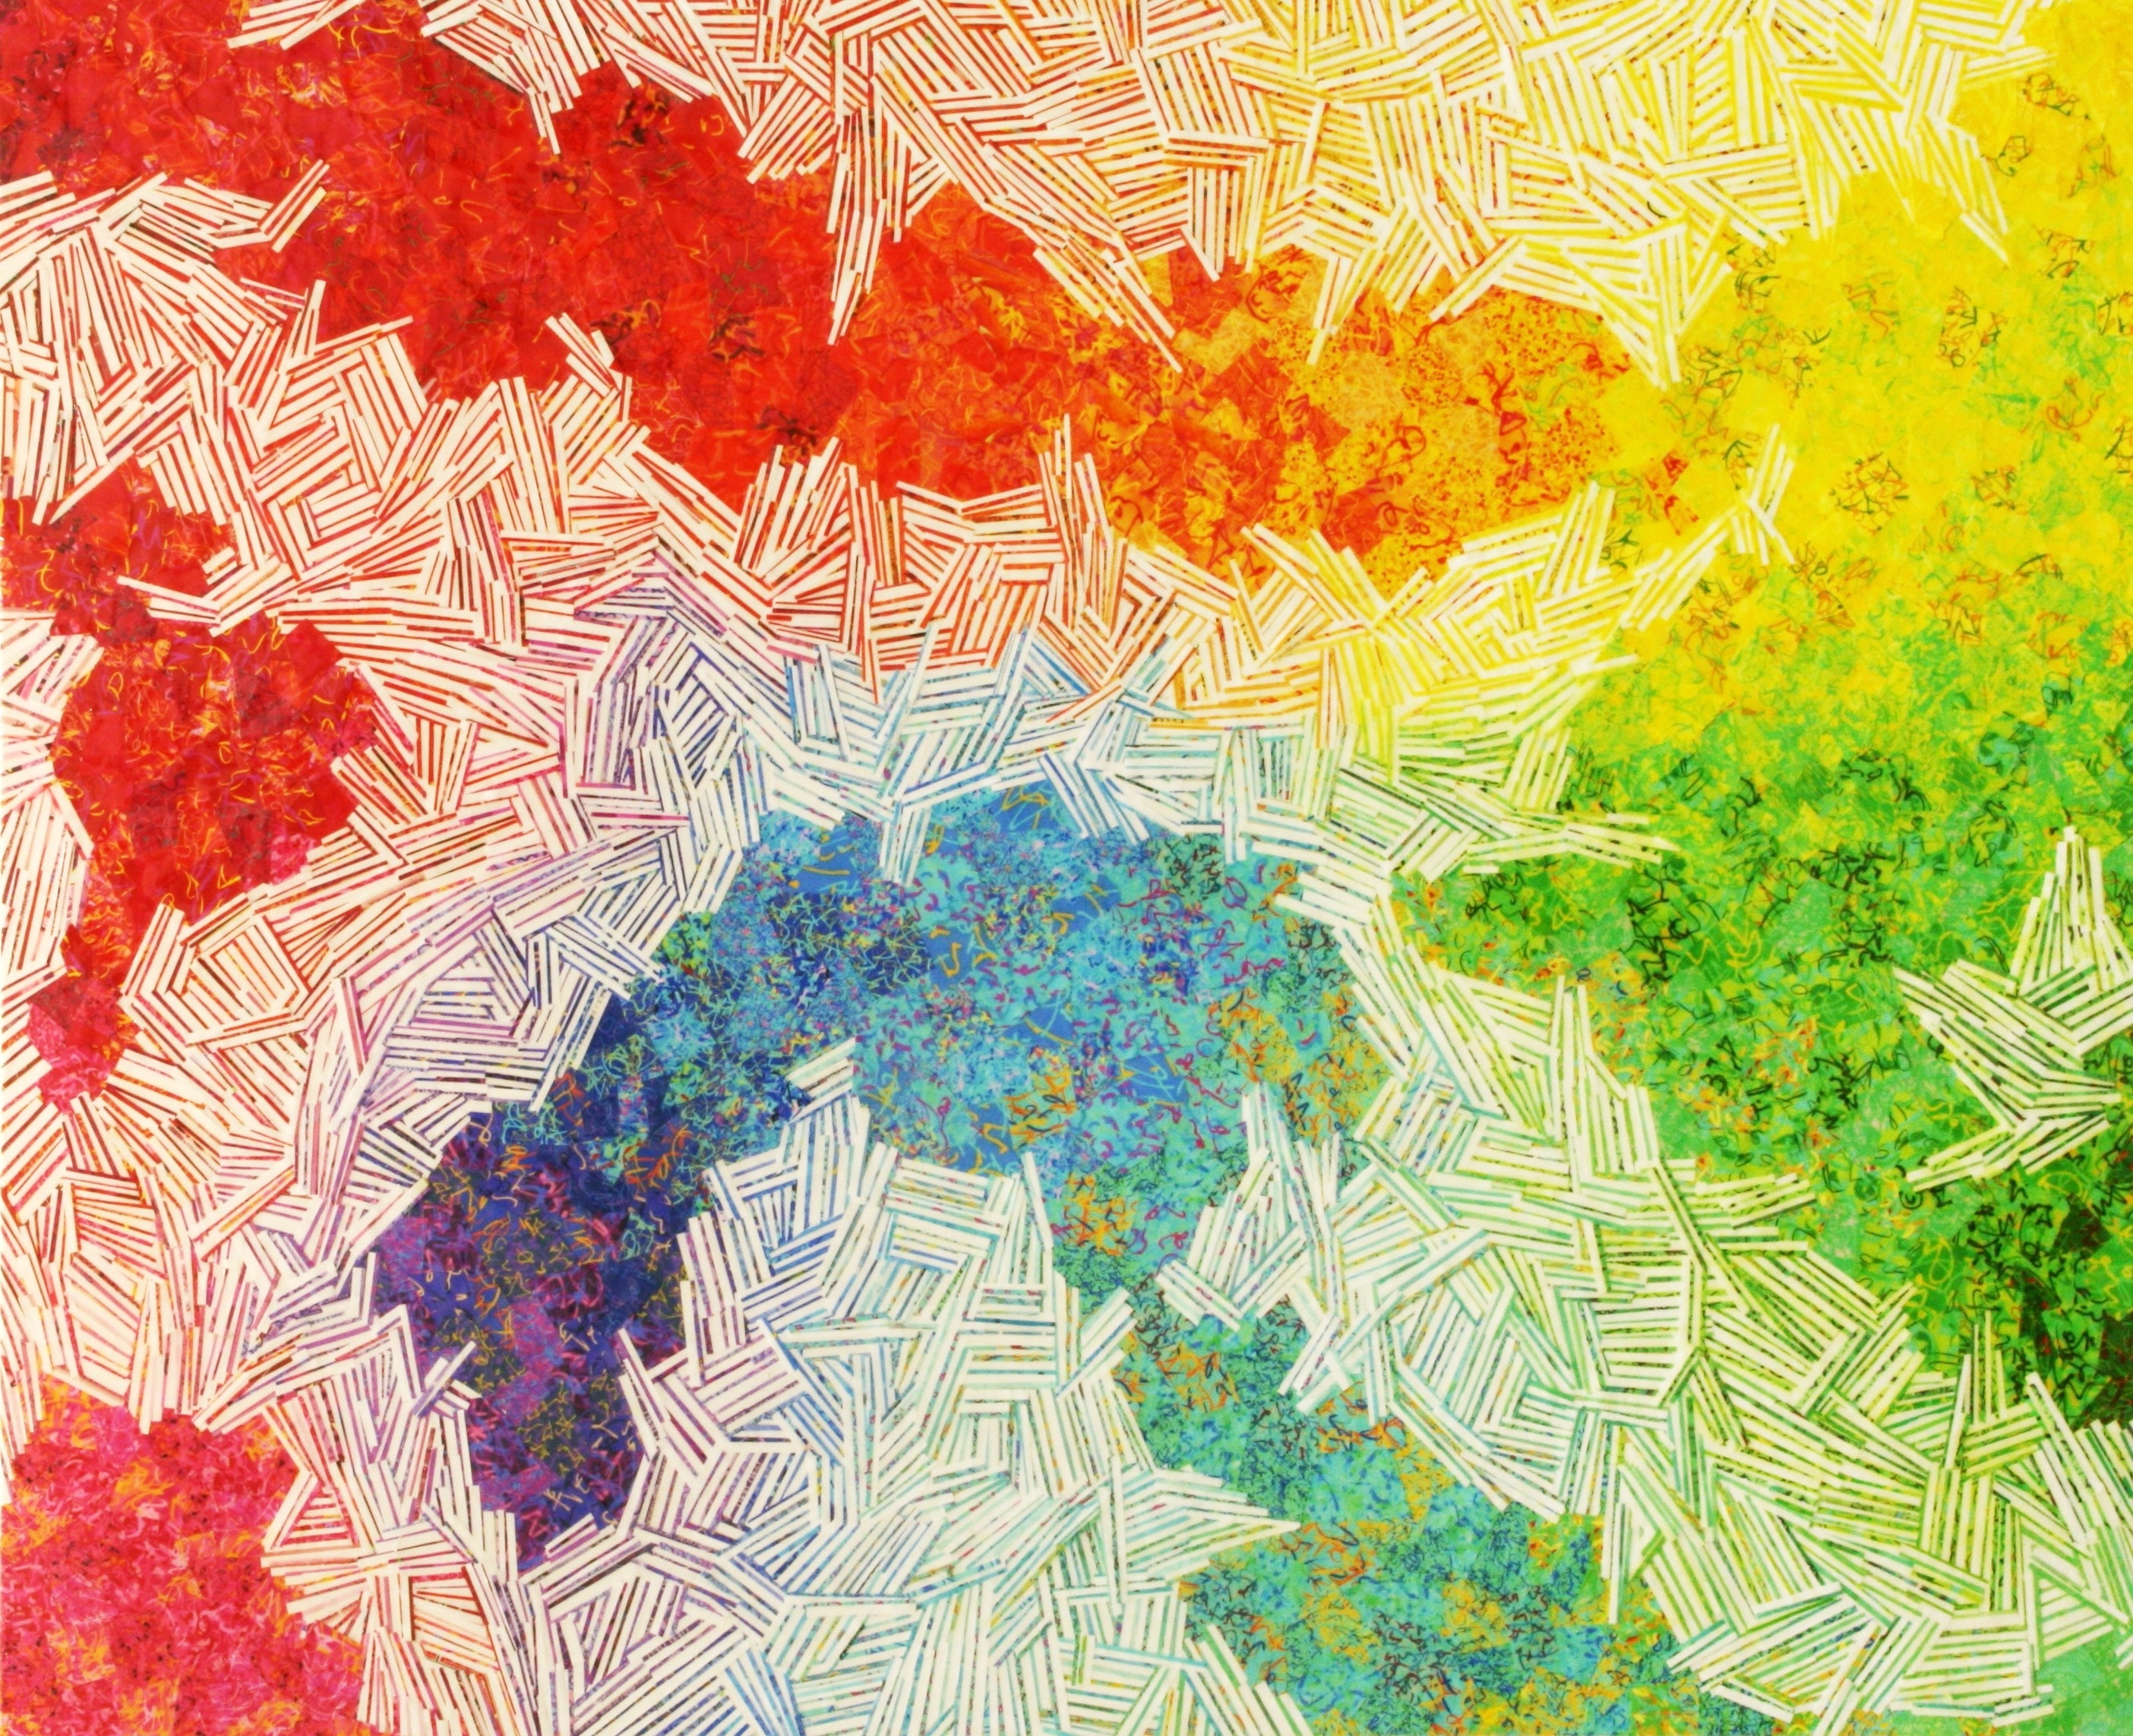 Spectrum-107485-edited.jpg